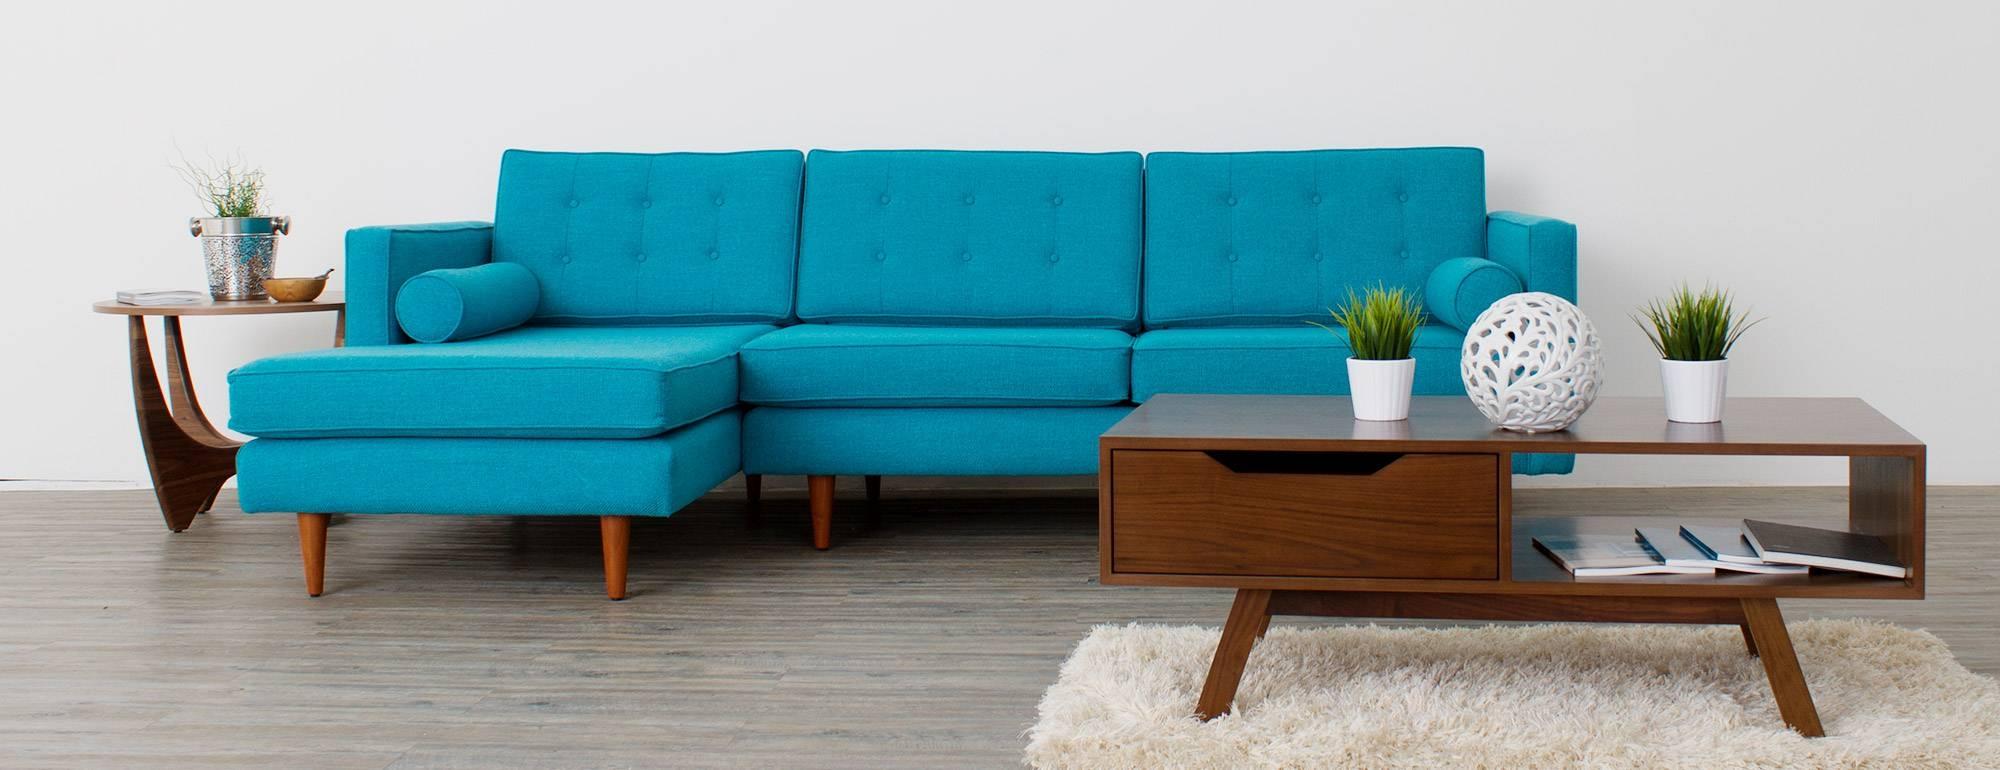 Braxton Sectional | Joybird pertaining to Braxton Sofa (Image 12 of 30)